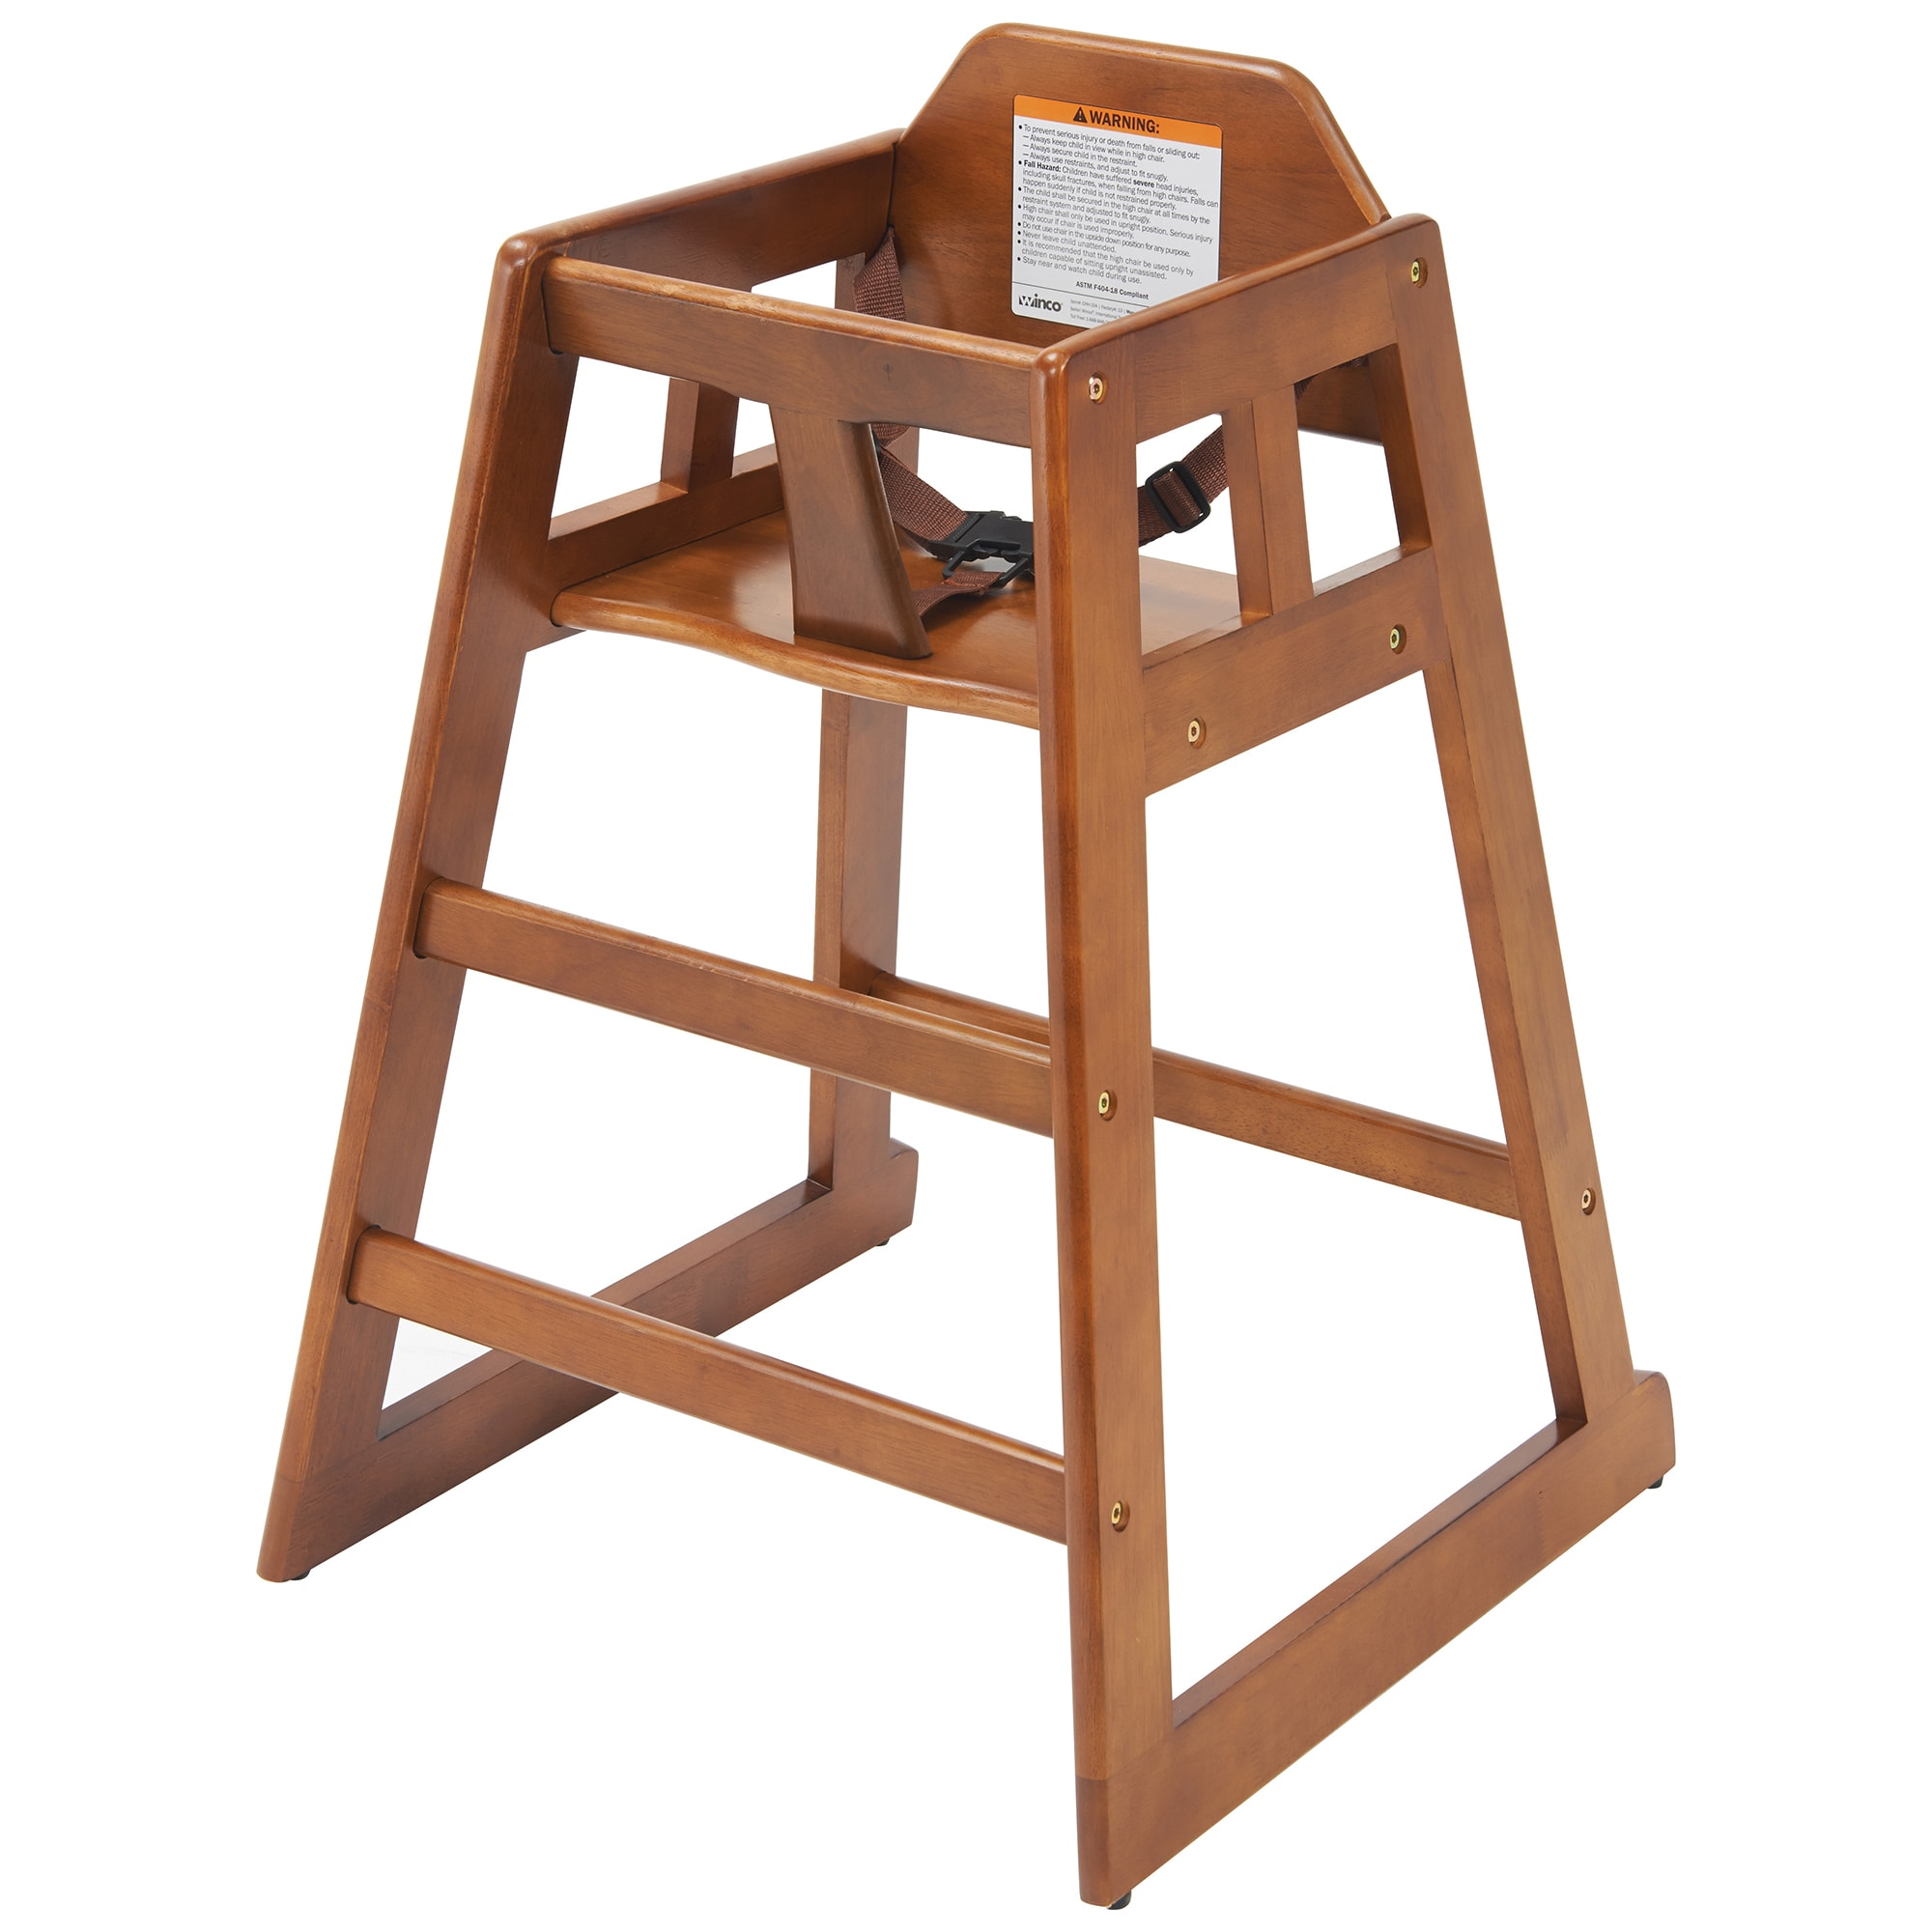 "Winco CHH-104A 29.75"" Stackable High Chair w/ Waist Strap - Wood, Walnut"